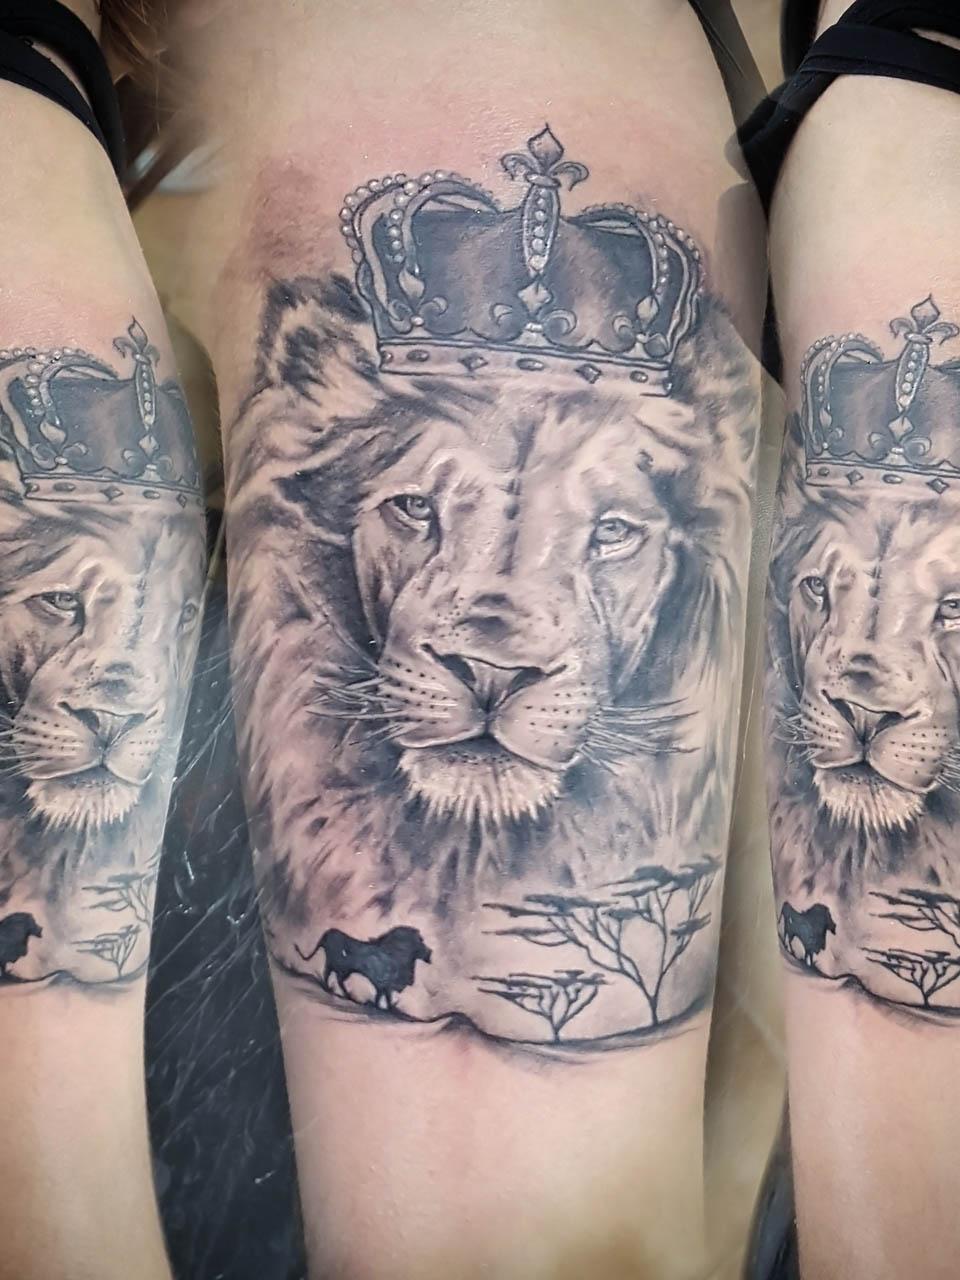 jose-andres-cardoso-tattoo-005-black-white-upper-arm